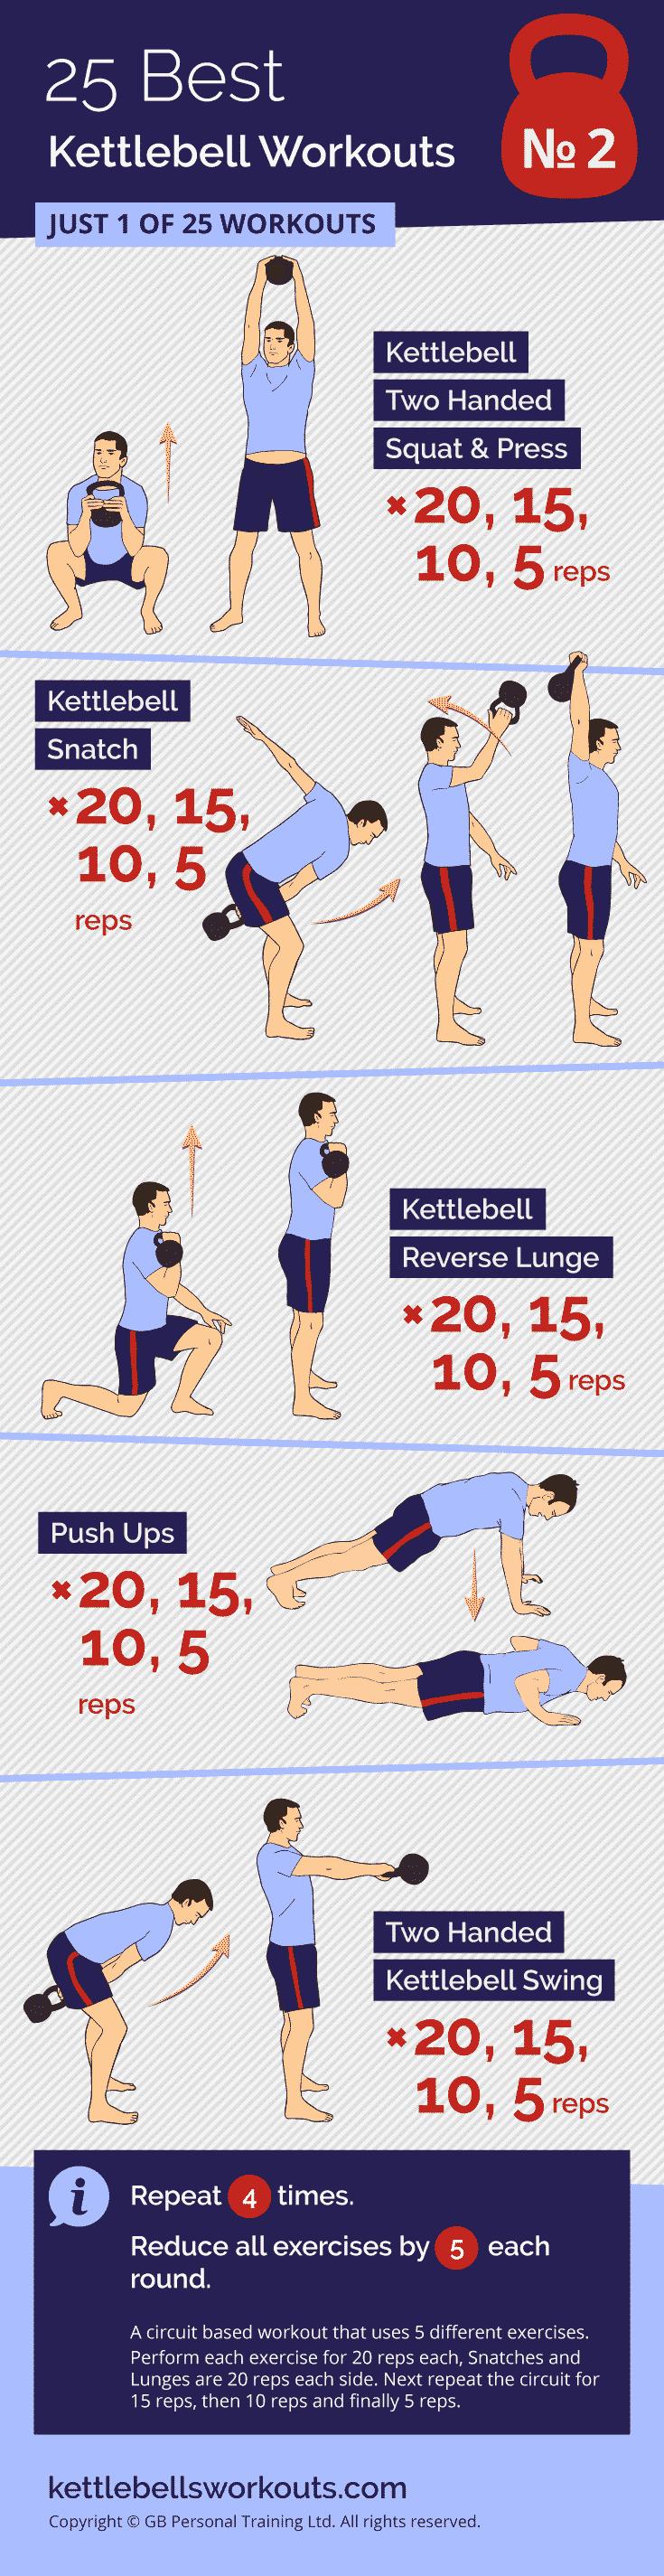 Take Five Kettlebell Circuit